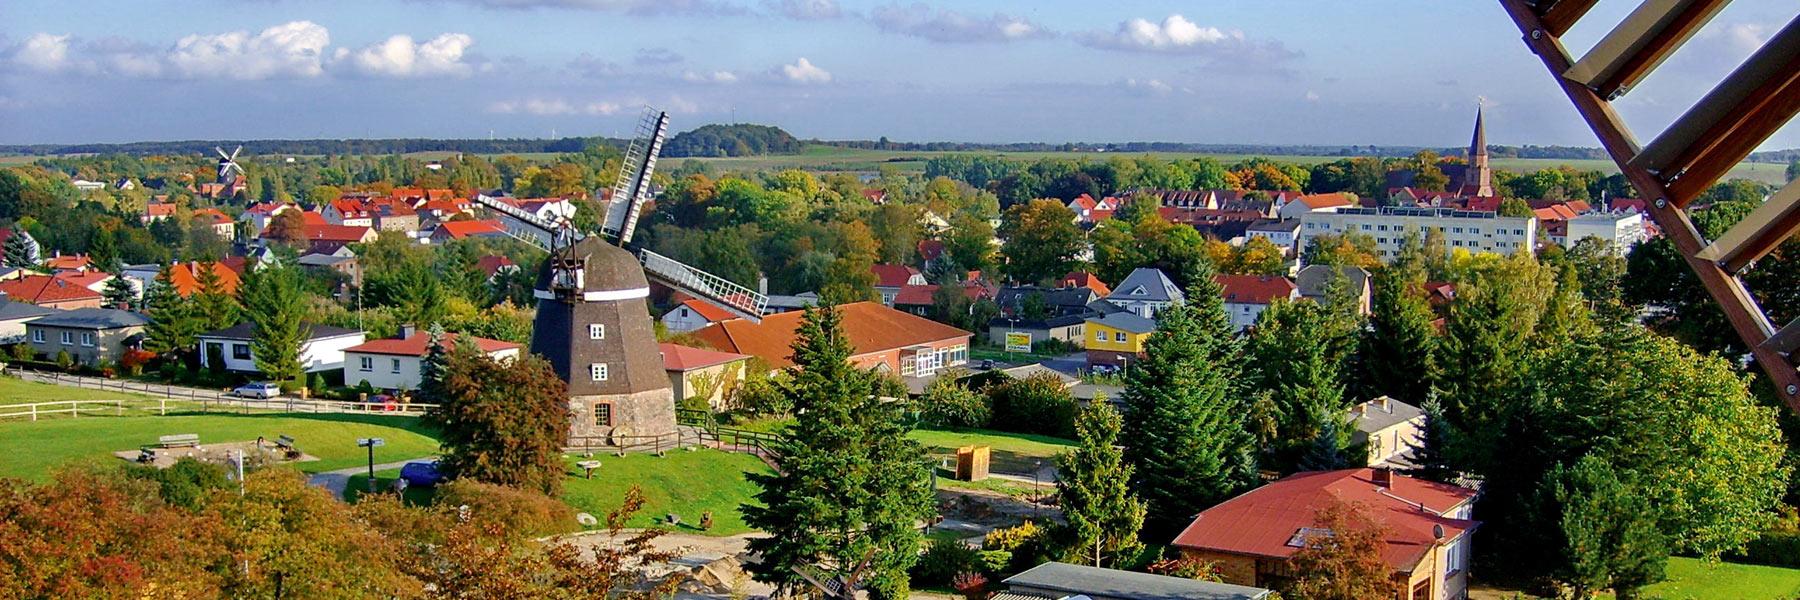 Mühlenberg - Stadt Woldegk